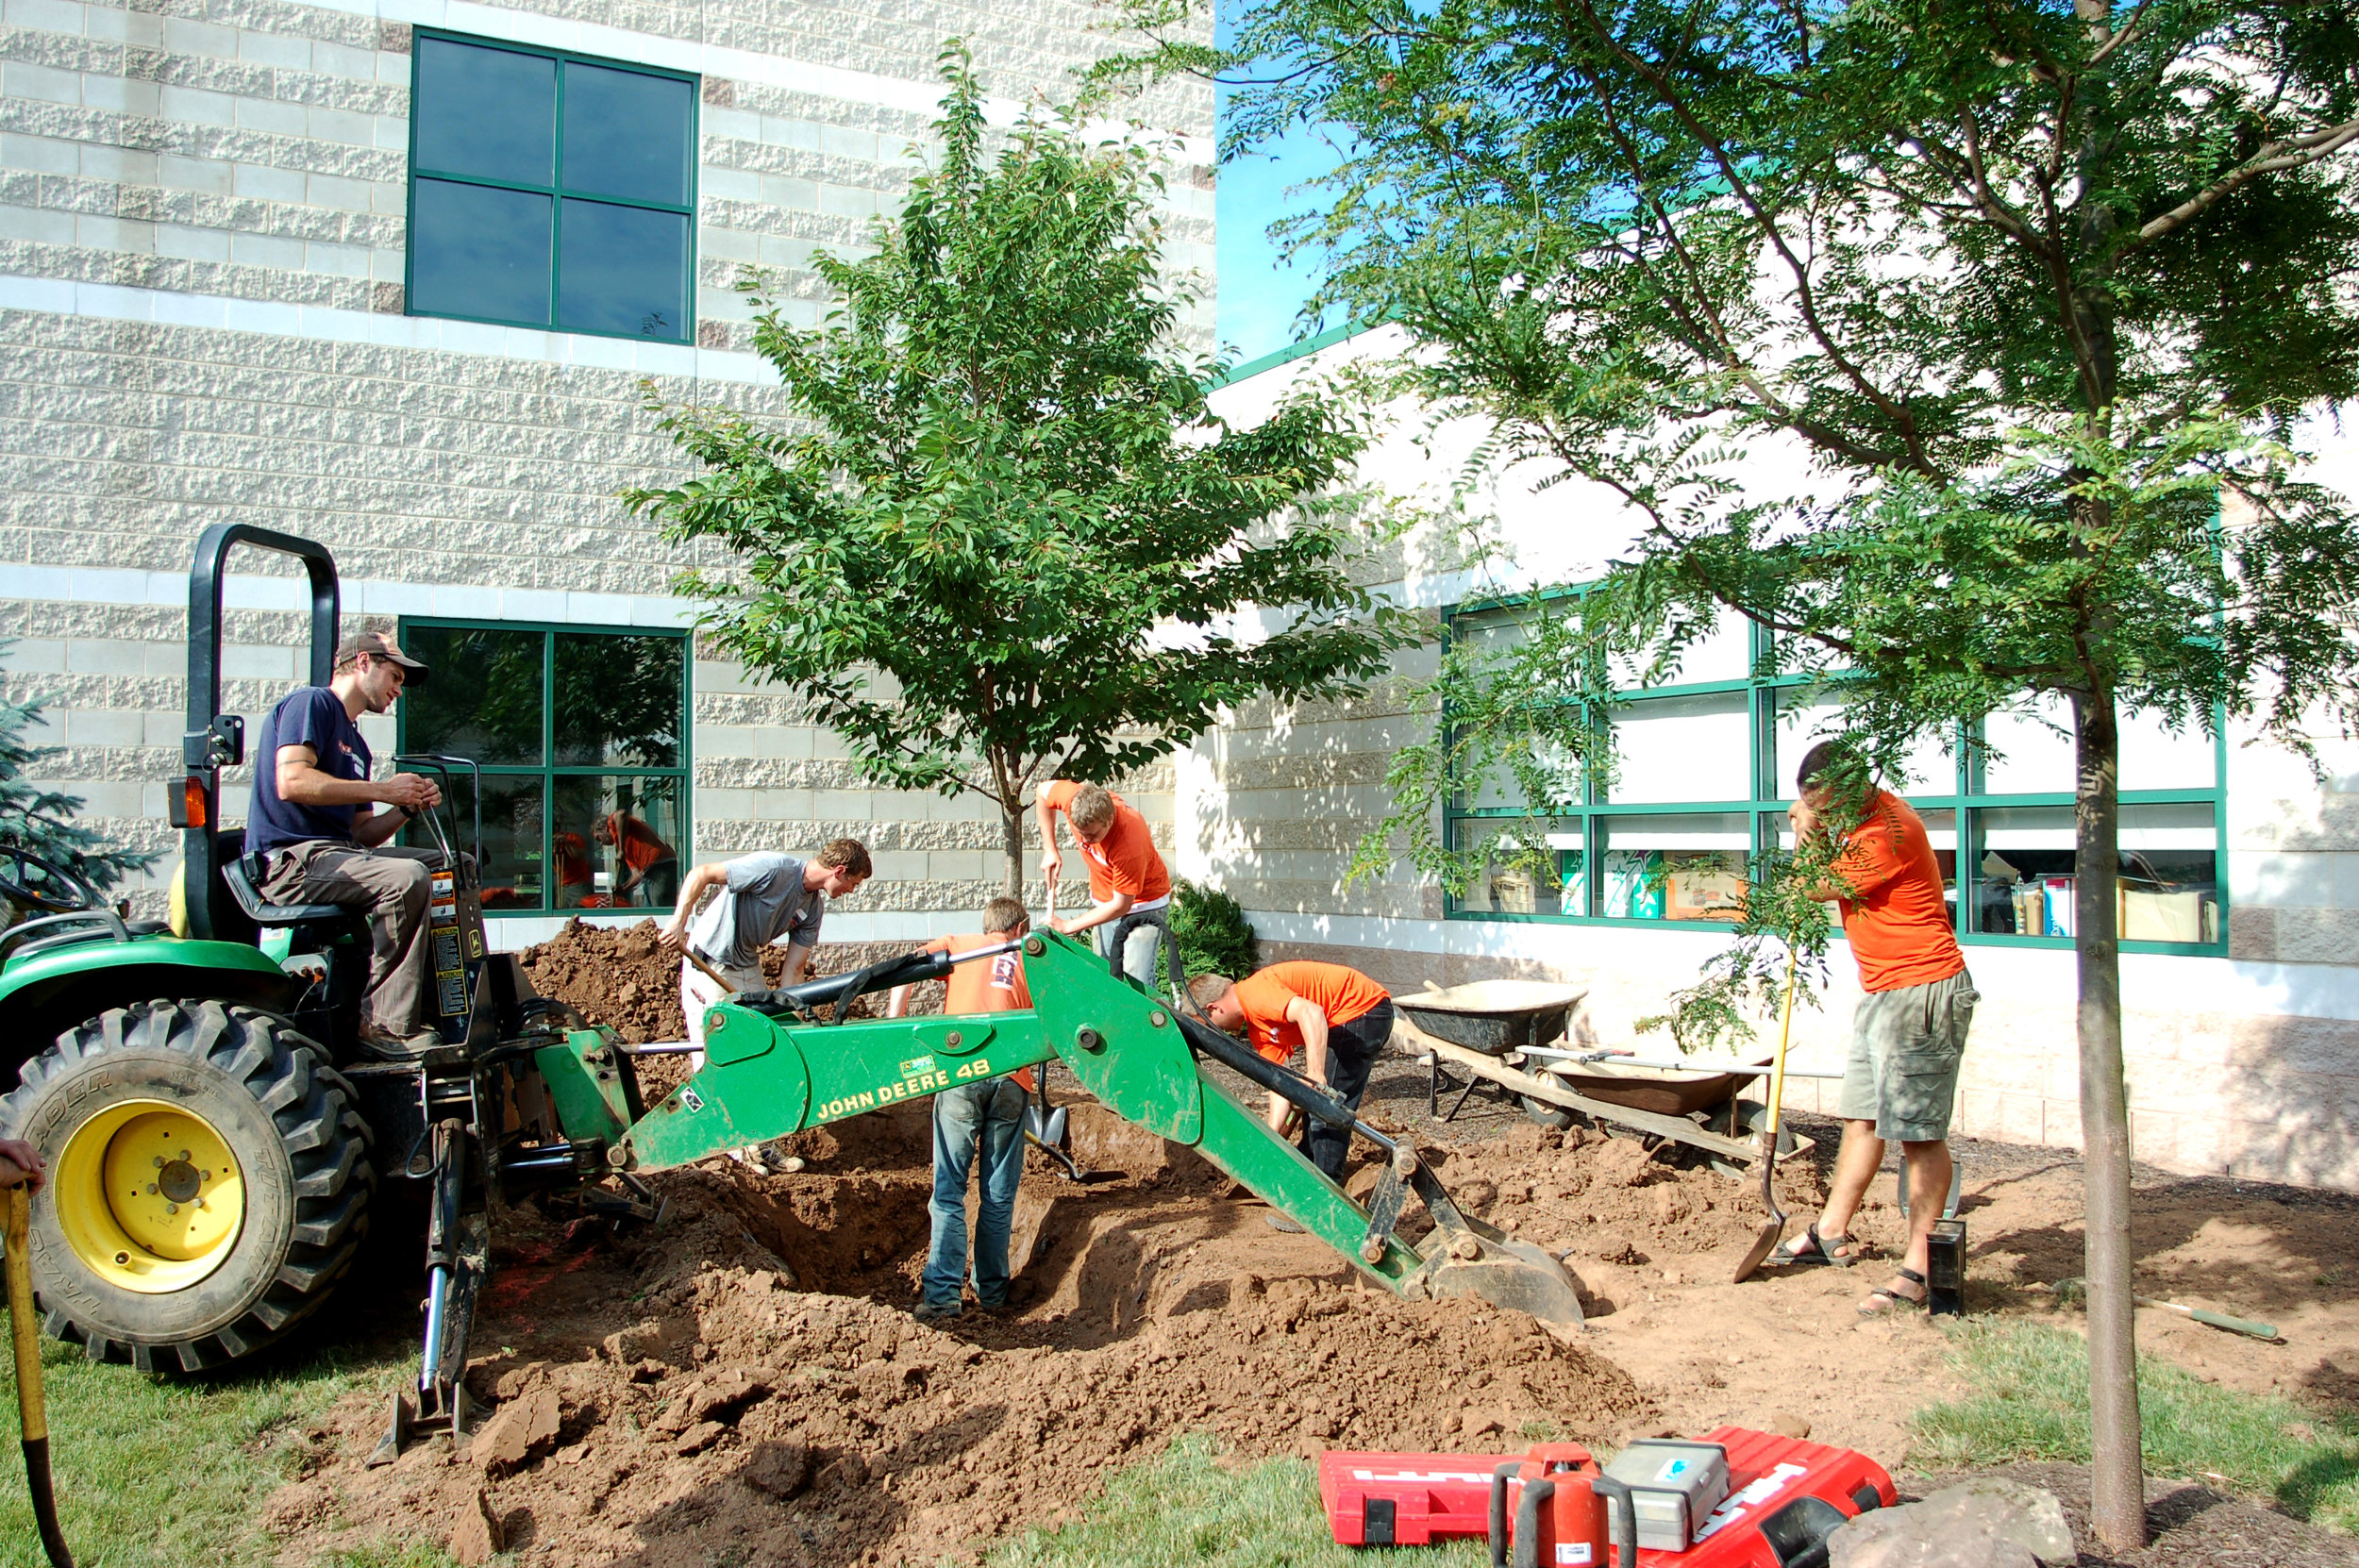 Pondworks_community_Design build_project_custom_Pond_PennView Christian School_01.JPG